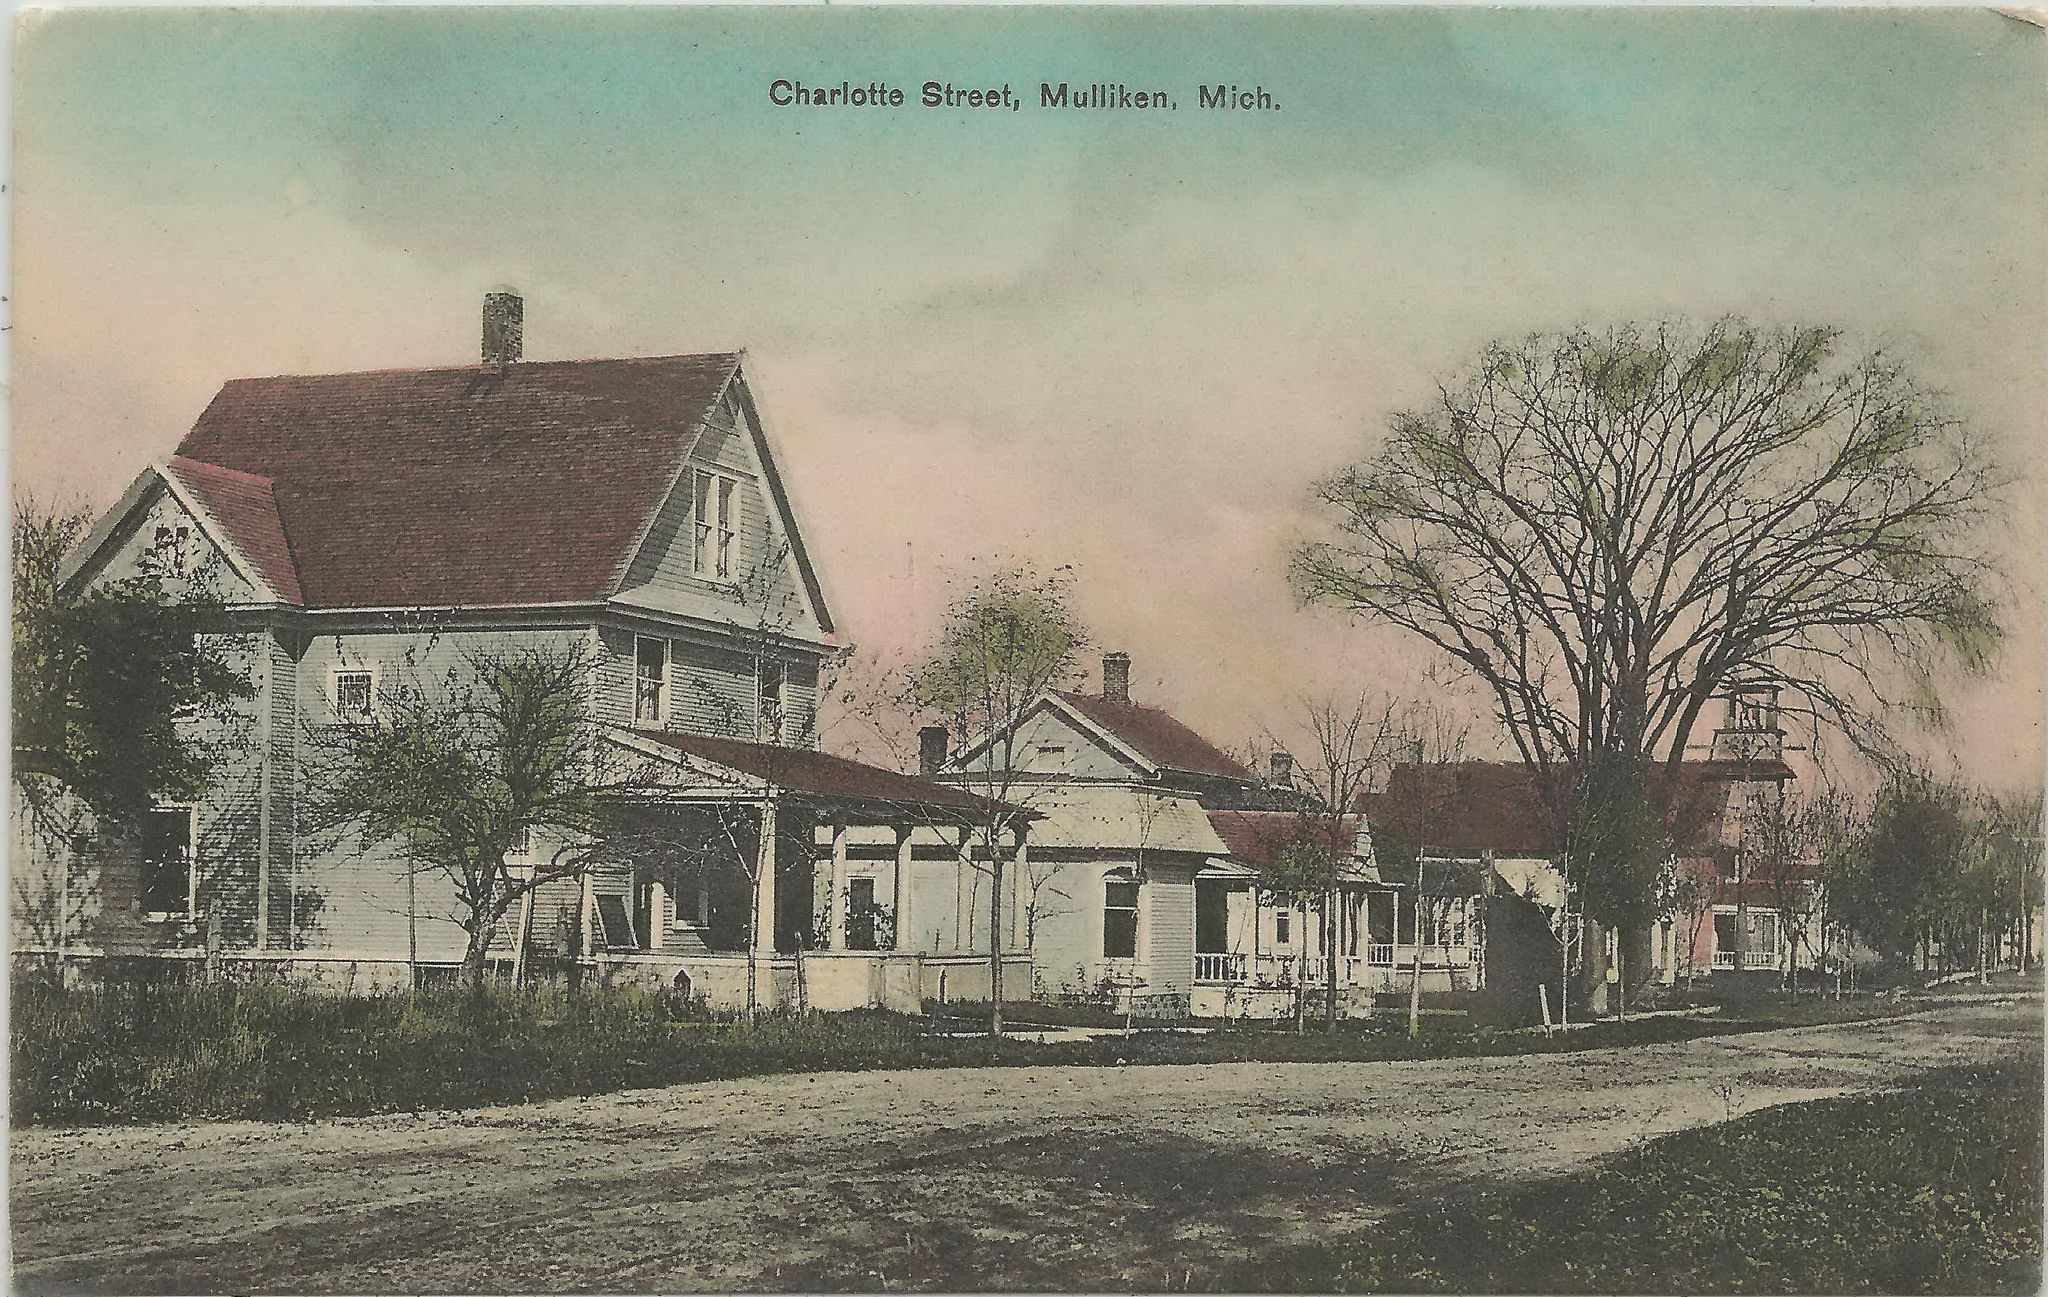 Michigan eaton county potterville - Charlotte